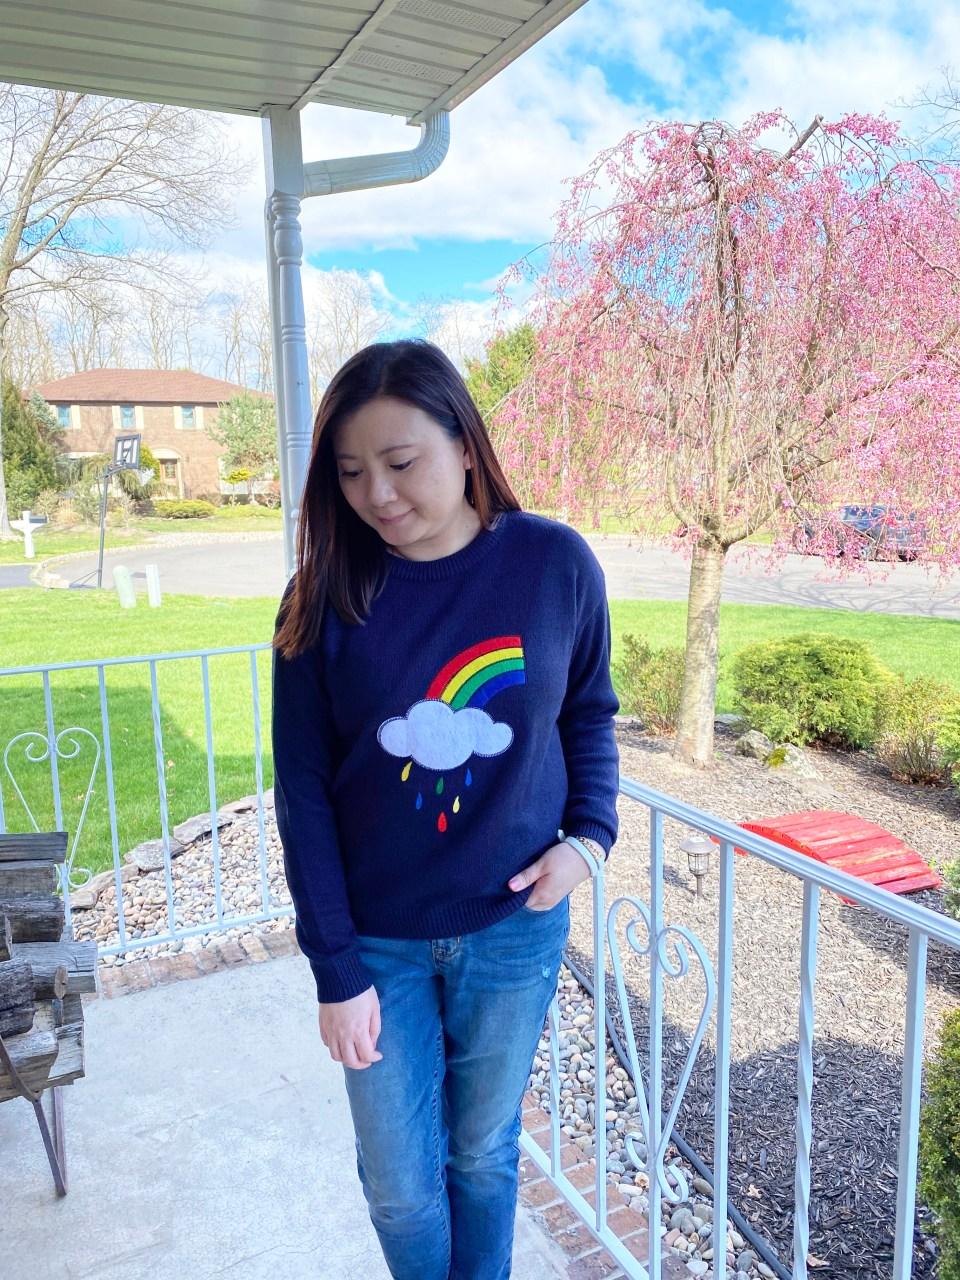 Rainbow & Cloud Sweater 1